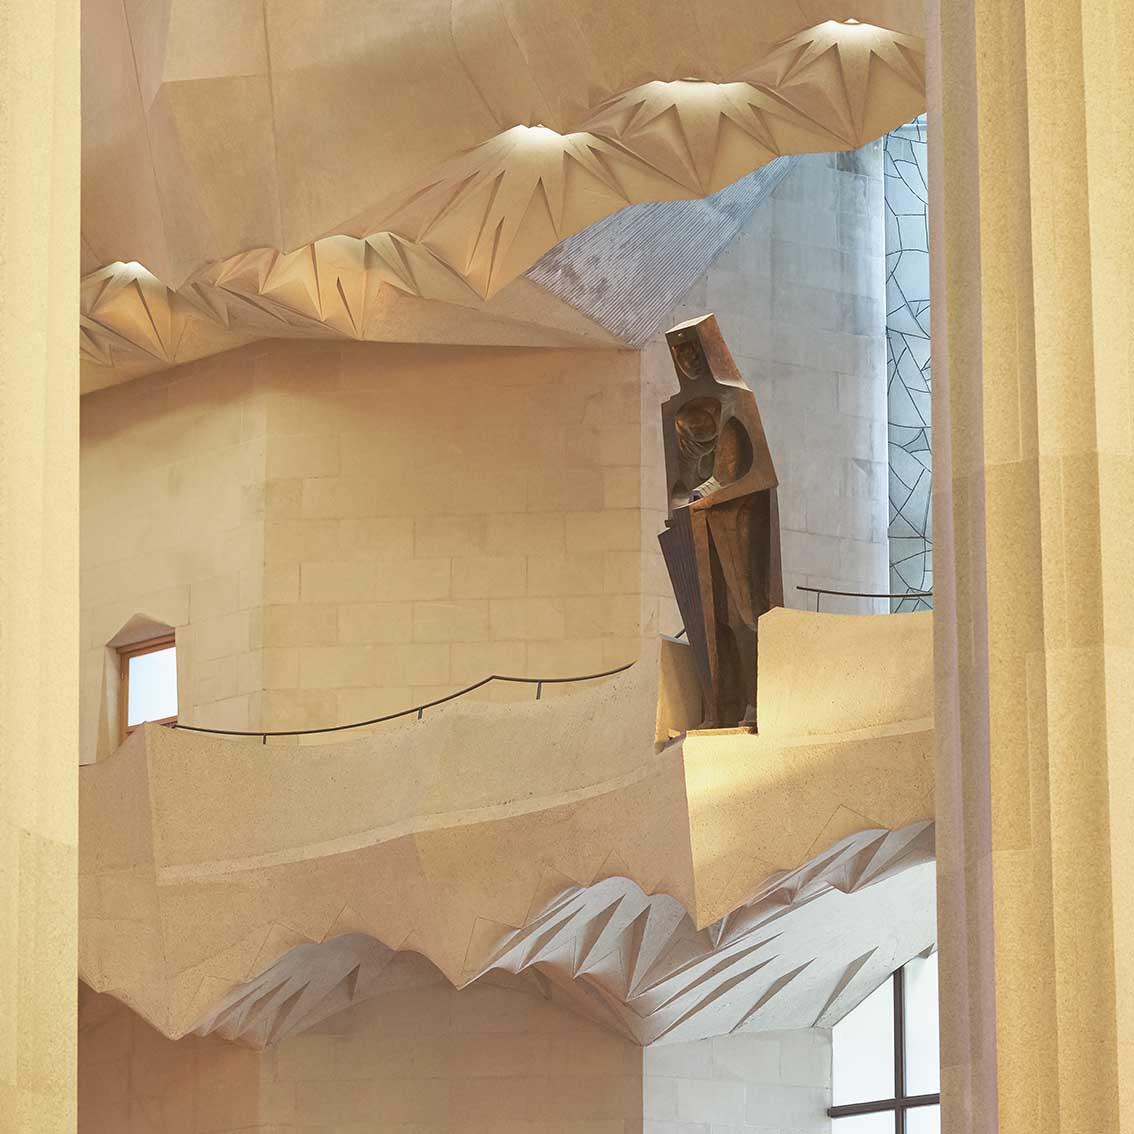 Pour-Gaudi-La-Sainte-Famille-4616-1x1